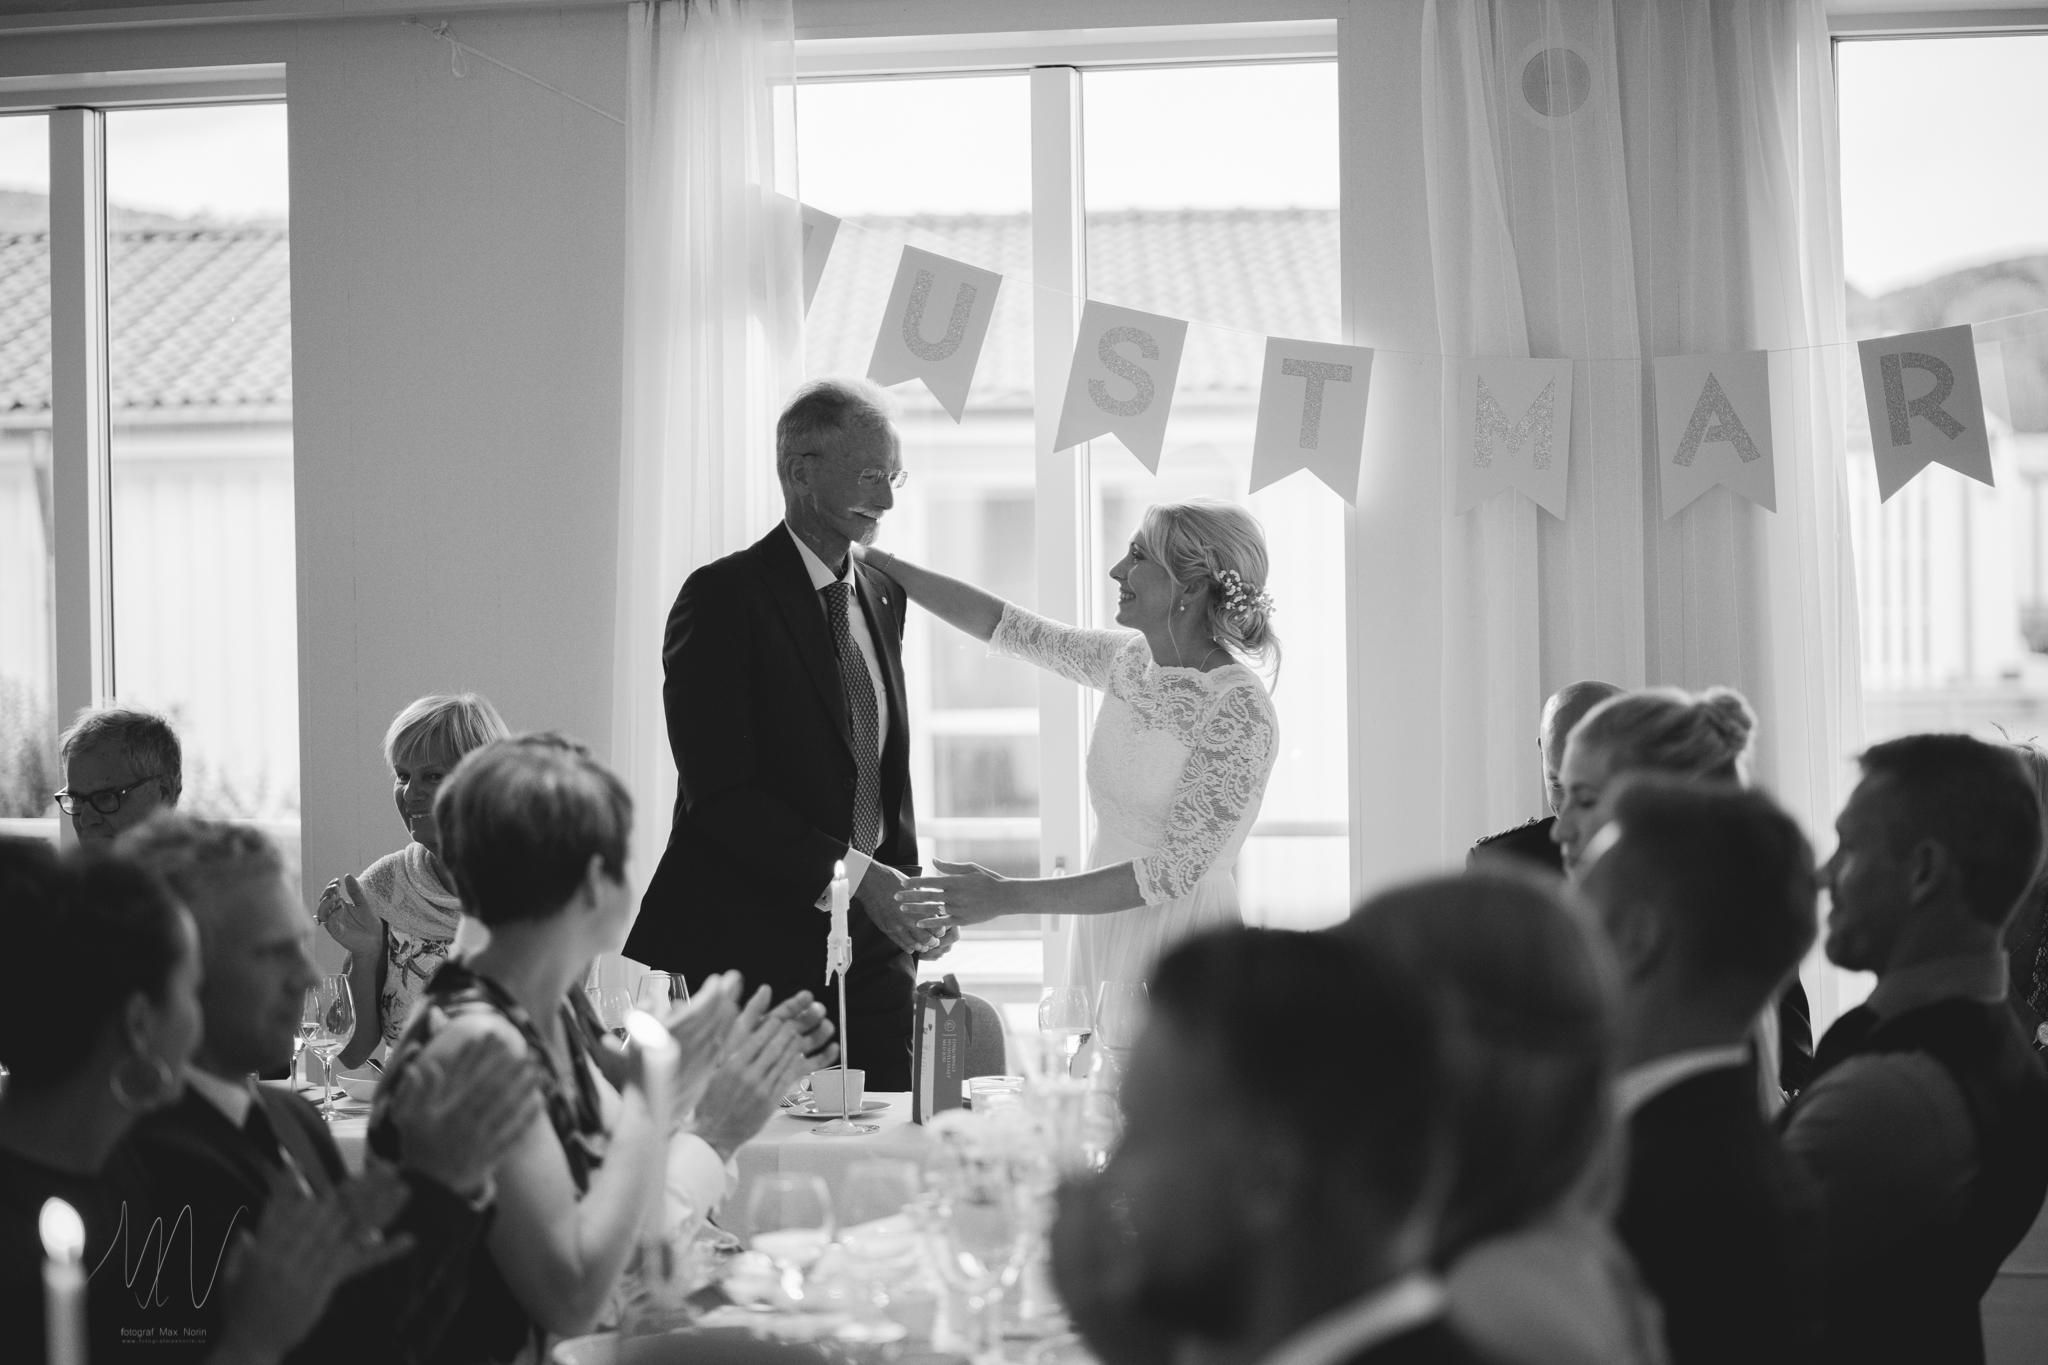 Bröllop-fotografmaxnorin.se-MariaMarcus-482.JPG